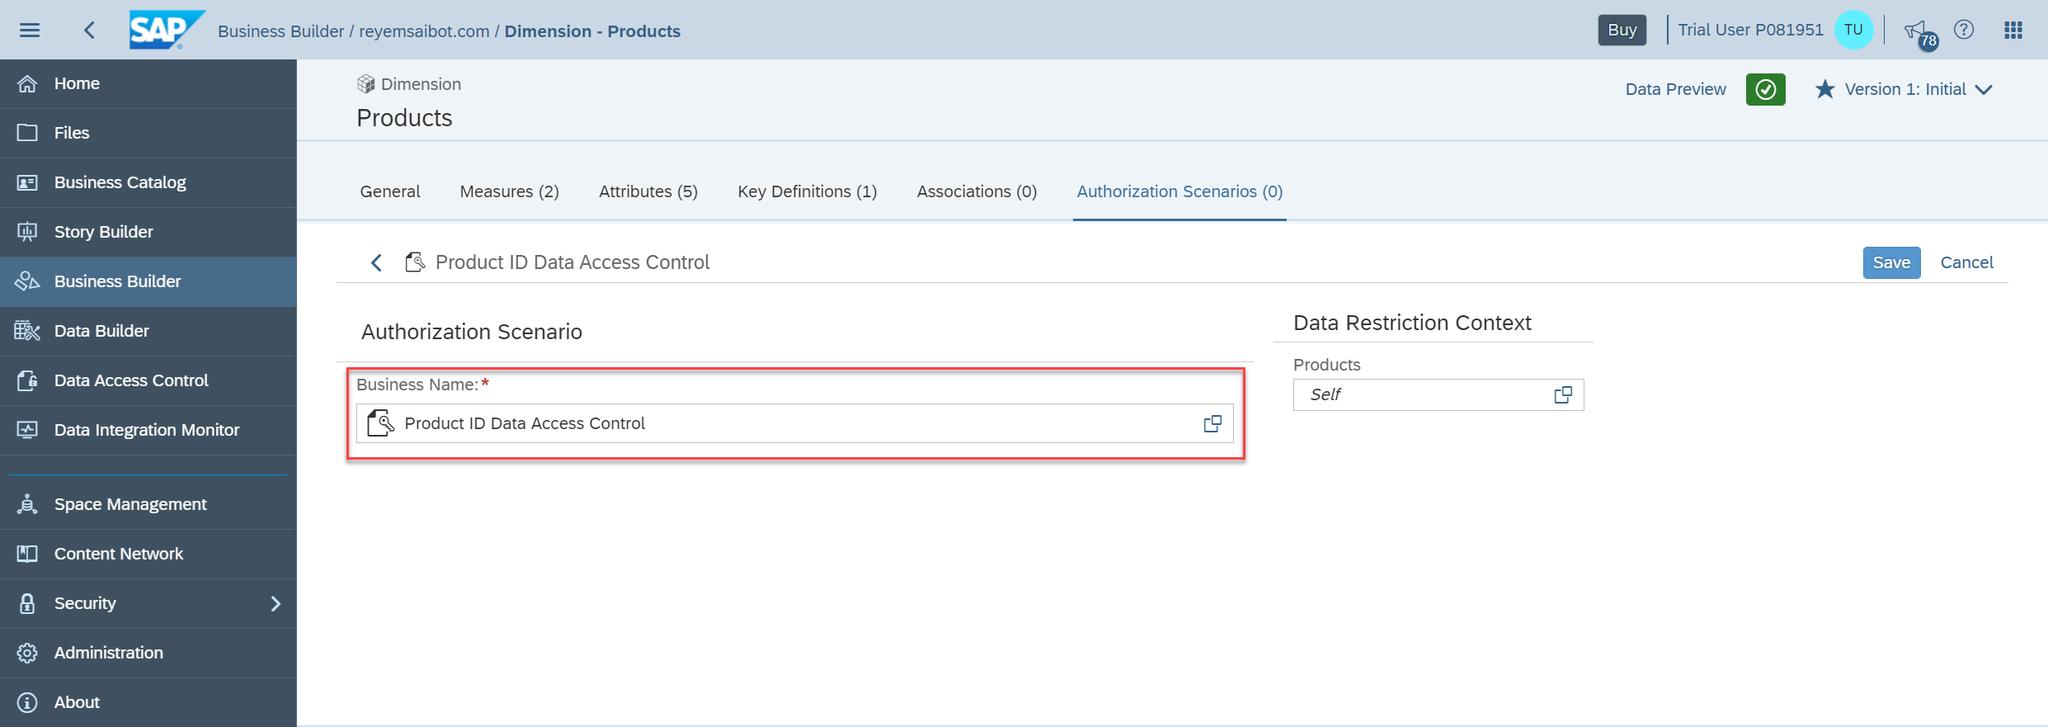 SAP Data Warehouse Cloud Define Authorization Scenario on Dimension